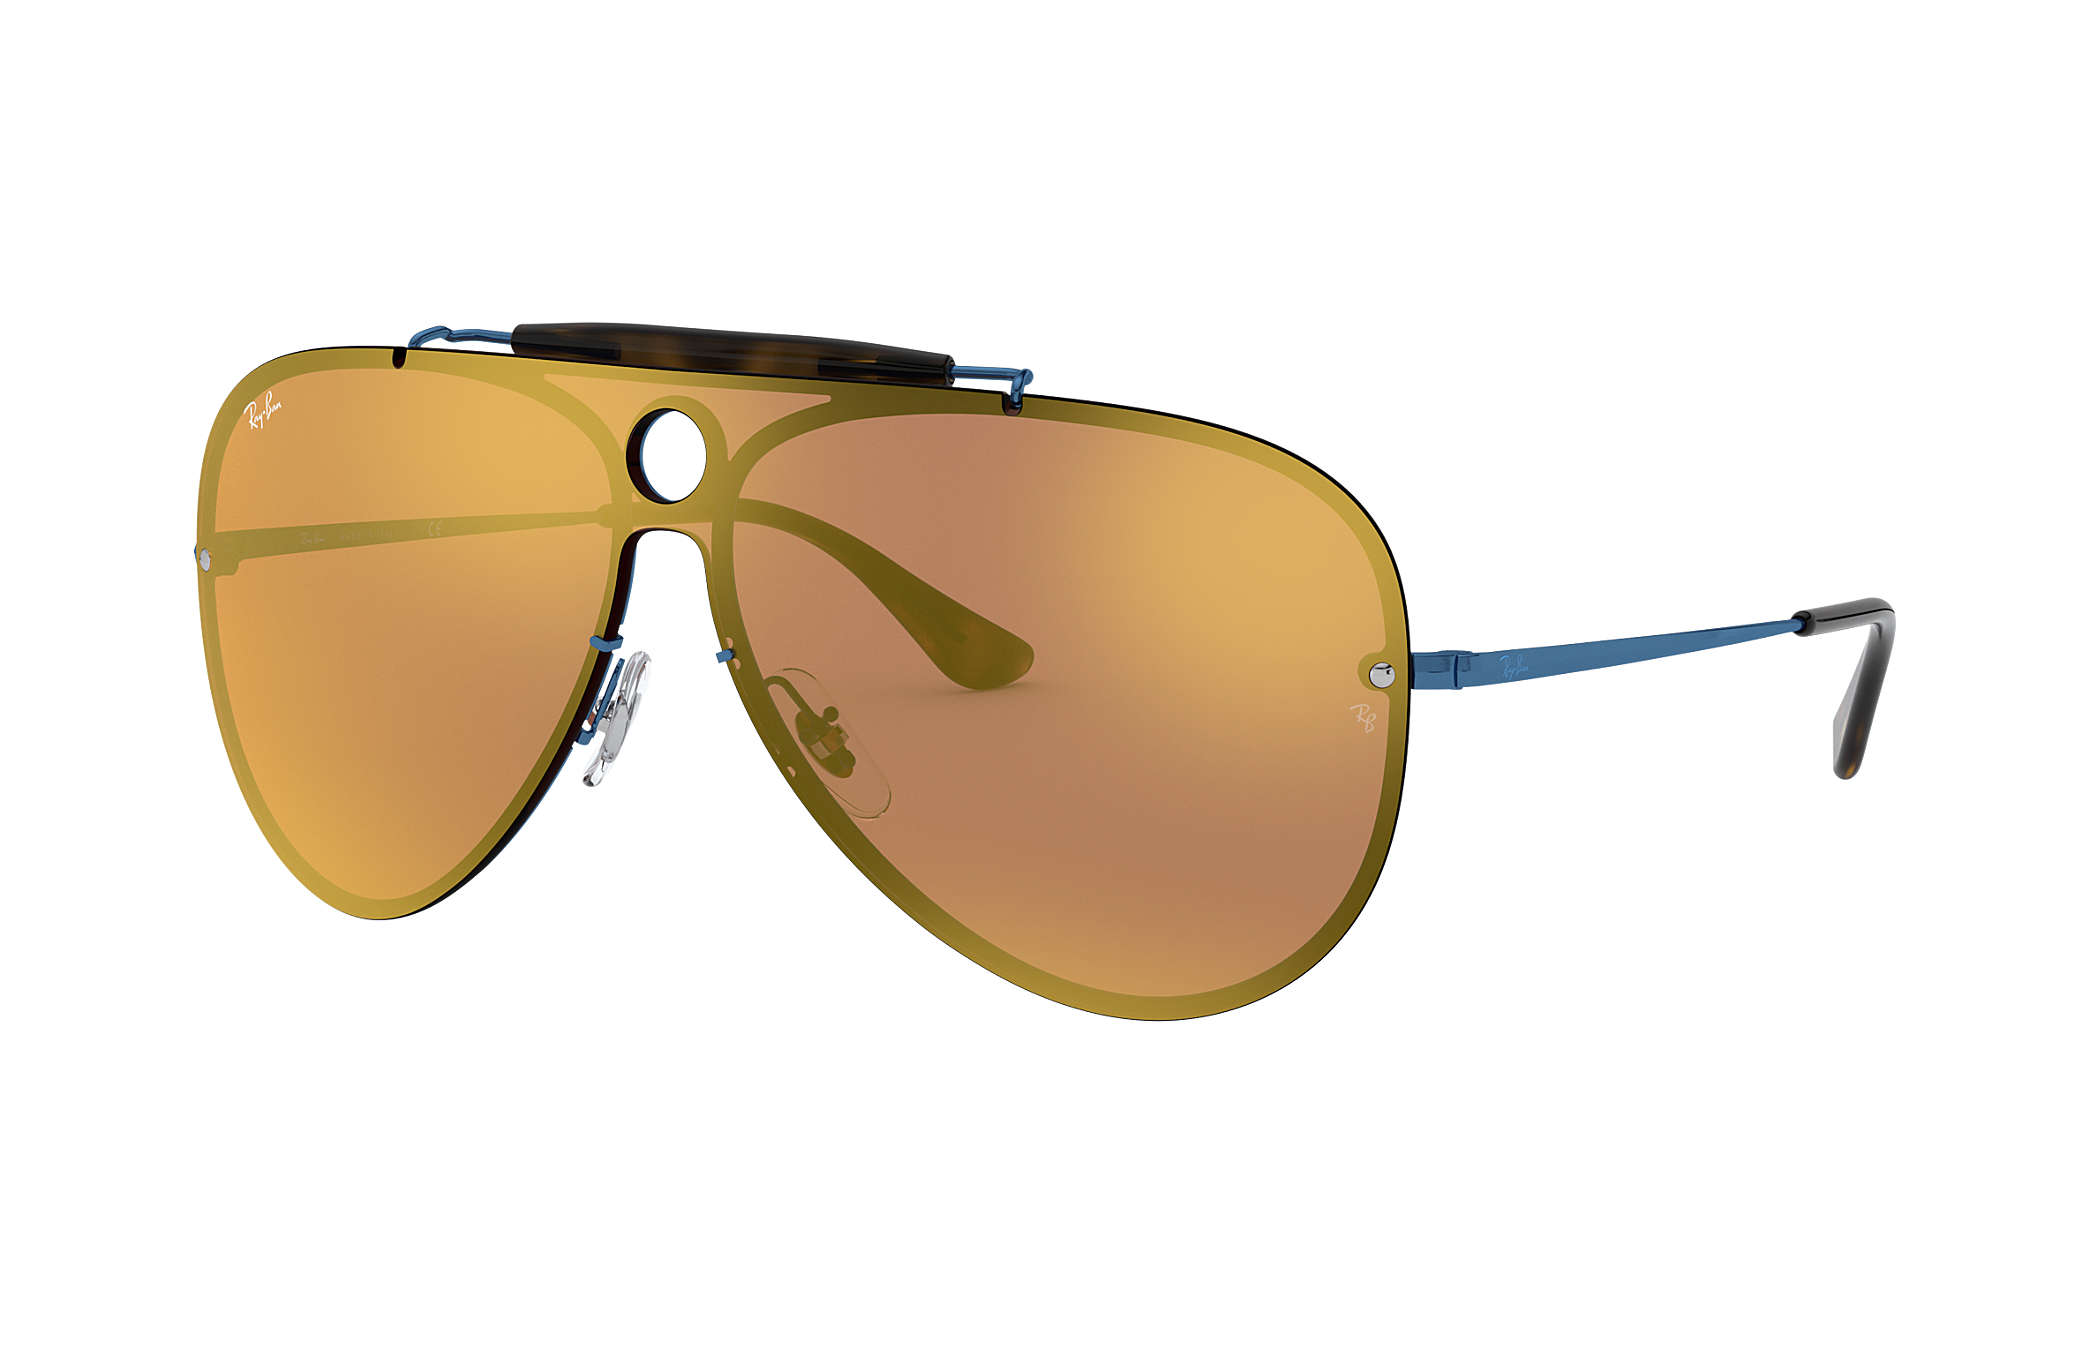 be89db16f5 Ray-Ban Blaze Shooter RB3581N Blue - Metal - Dark Orange Lenses ...